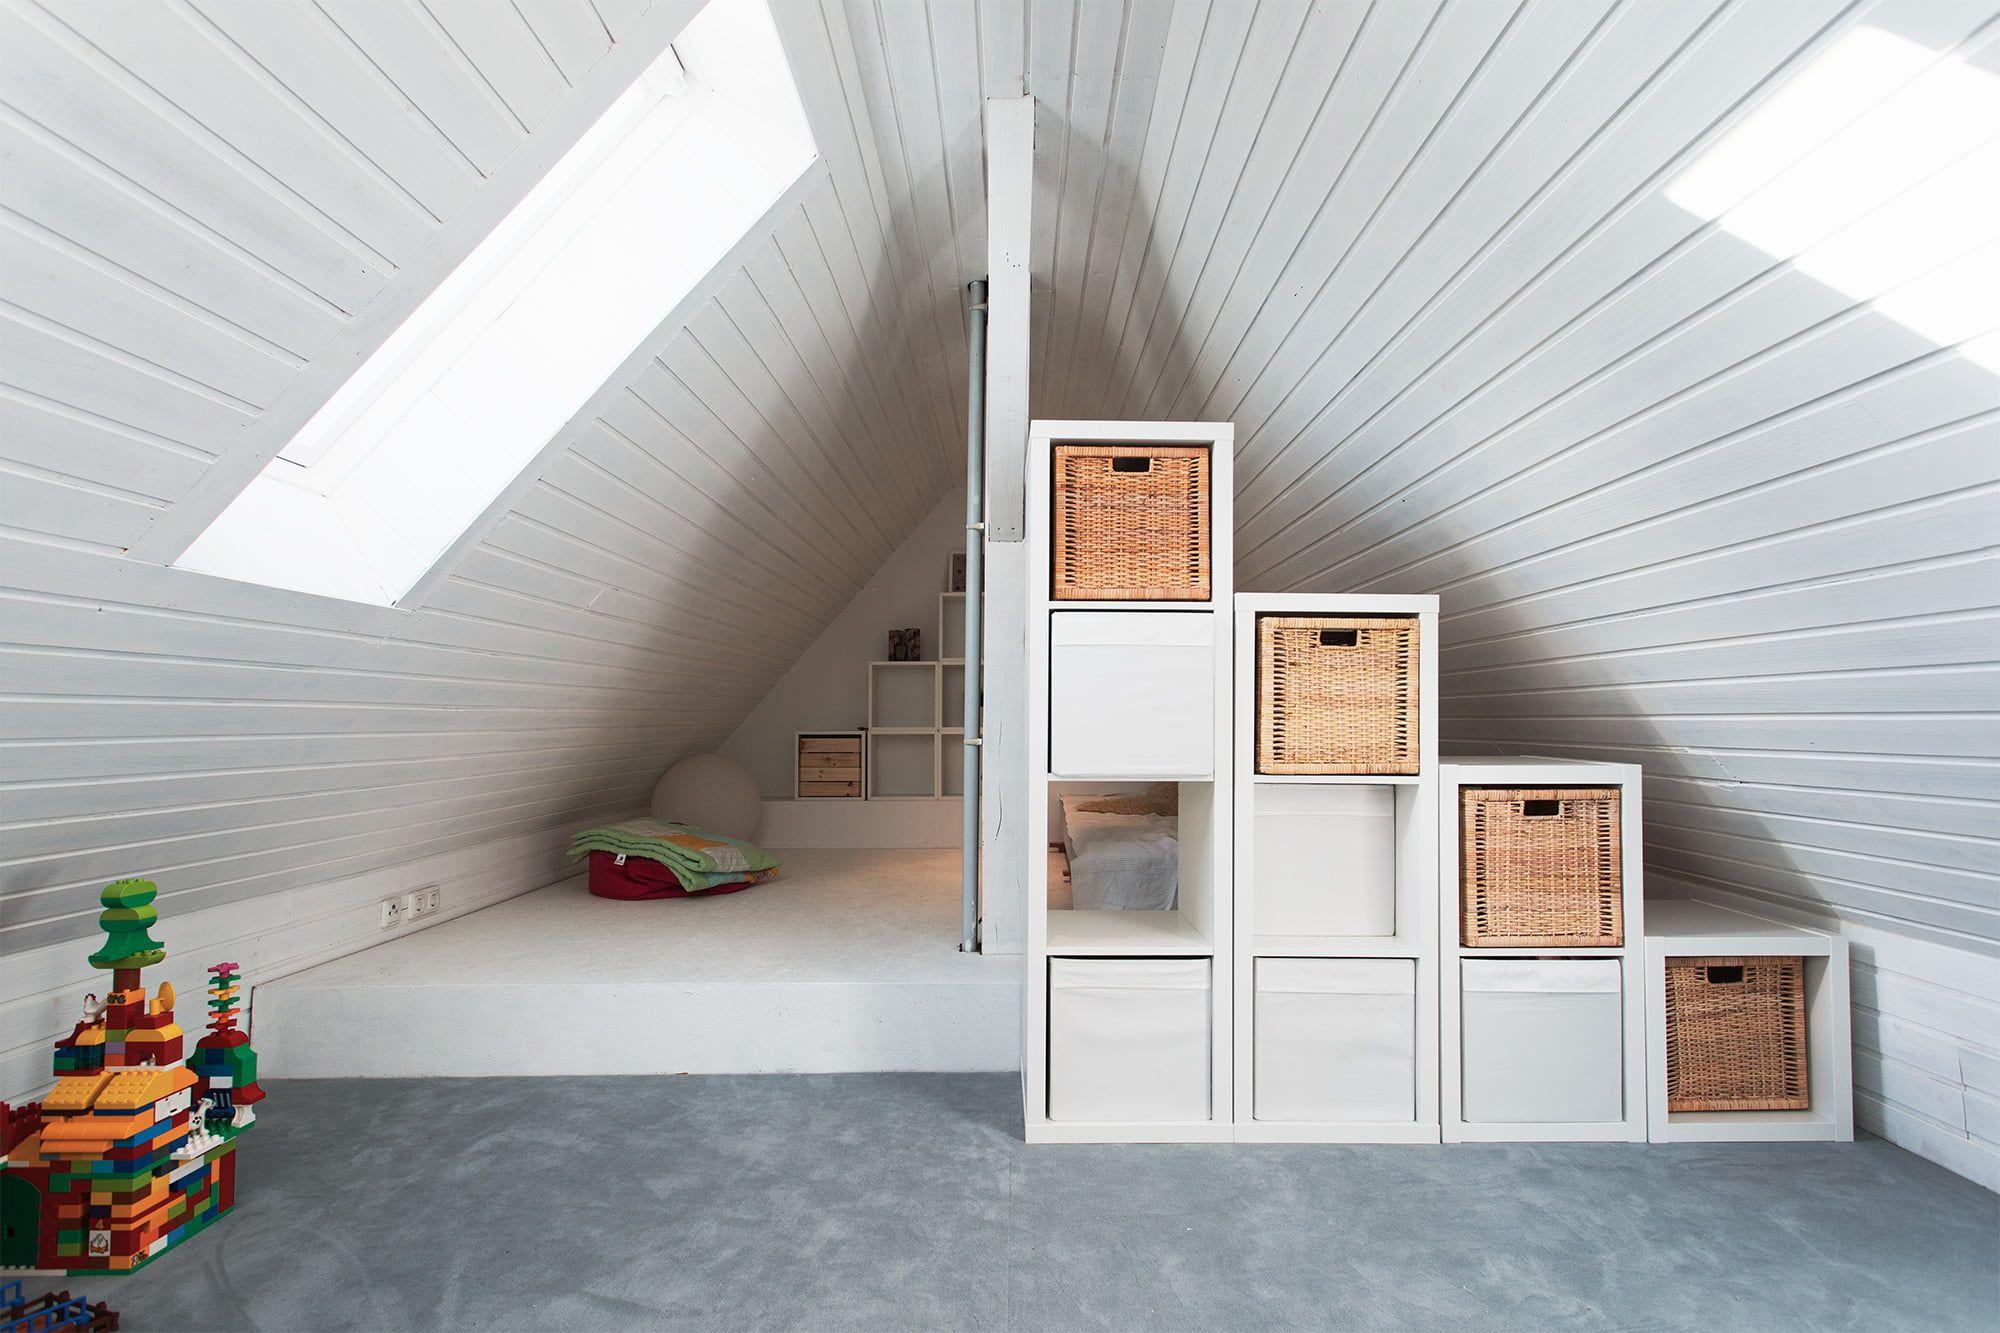 Umbau Dachgeschoss Spitzbodenausbau Robin Klein In 2020 Kleines Dachzimmer Einrichten Dachboden Renovierung Dachgeschoss